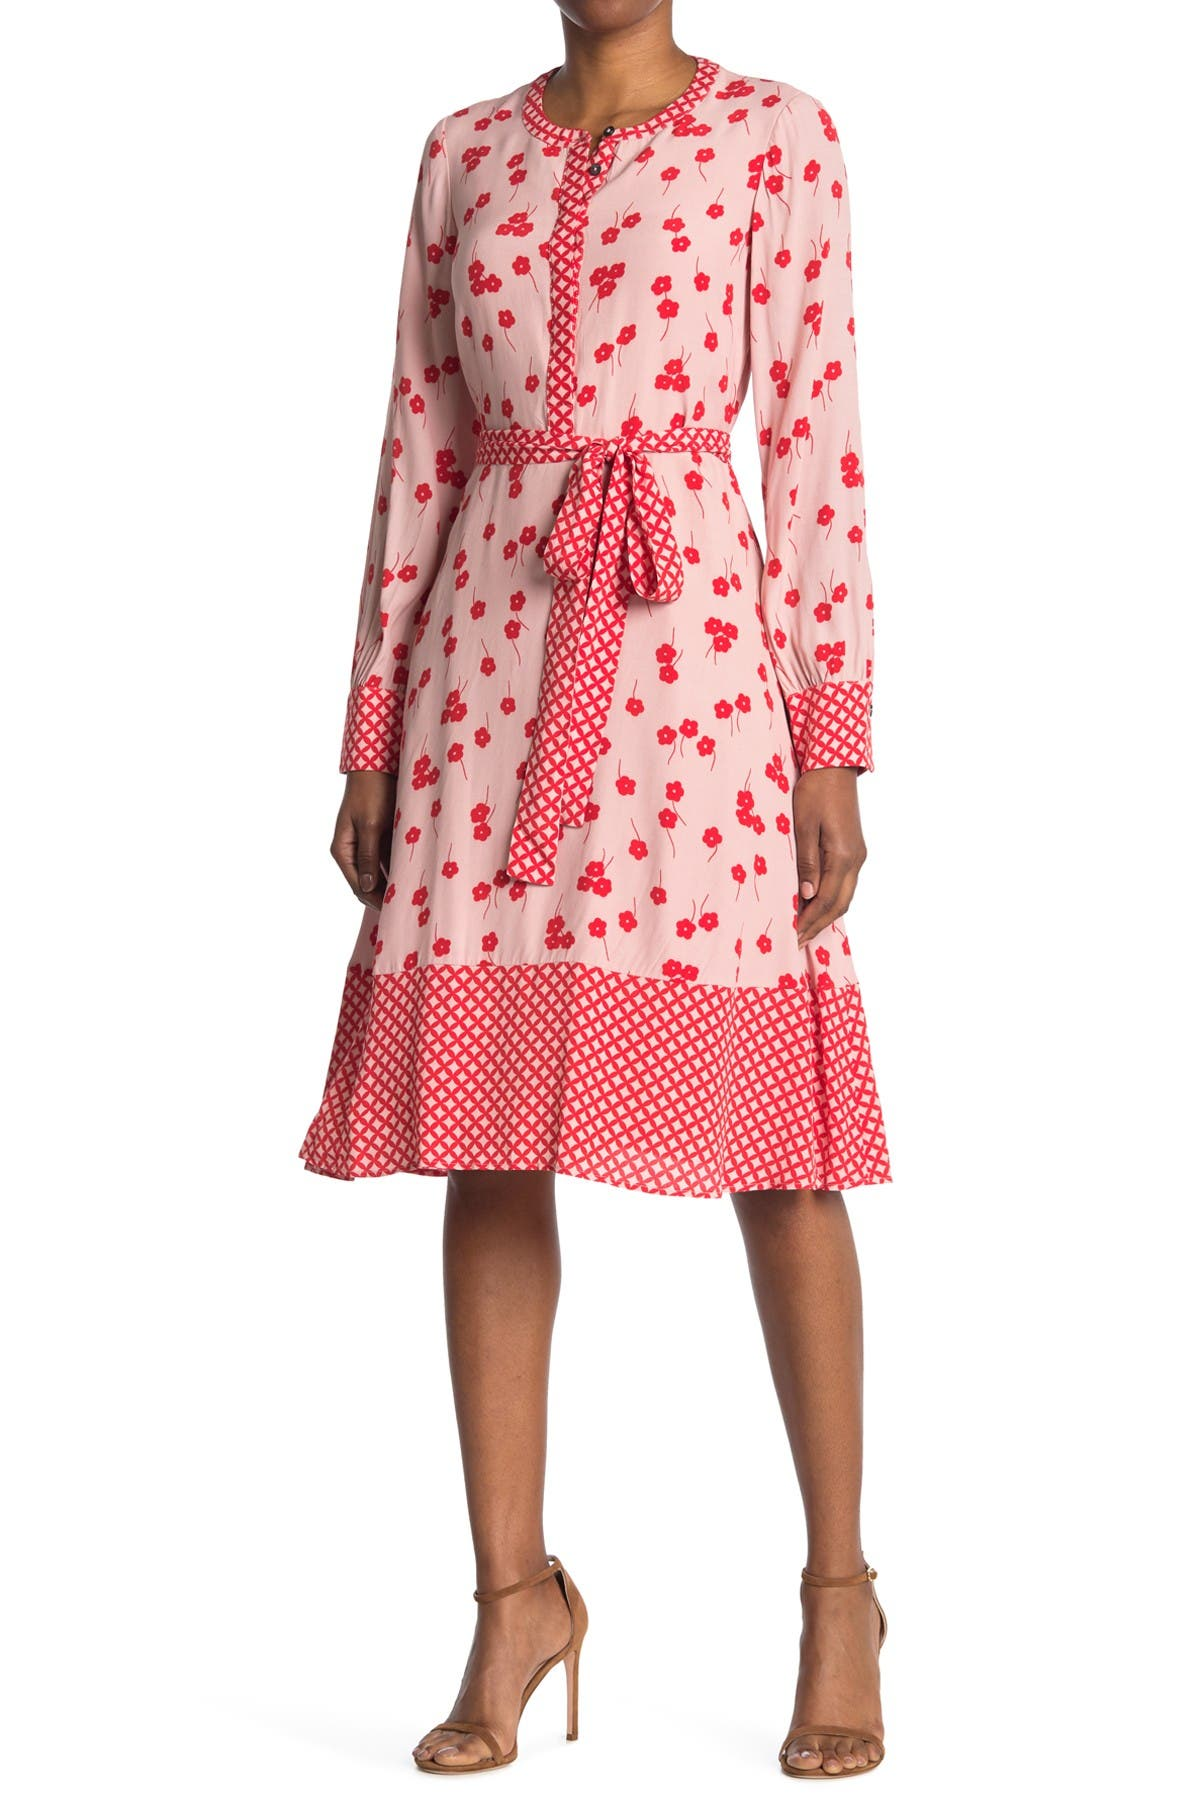 Image of BODEN Eva Dress